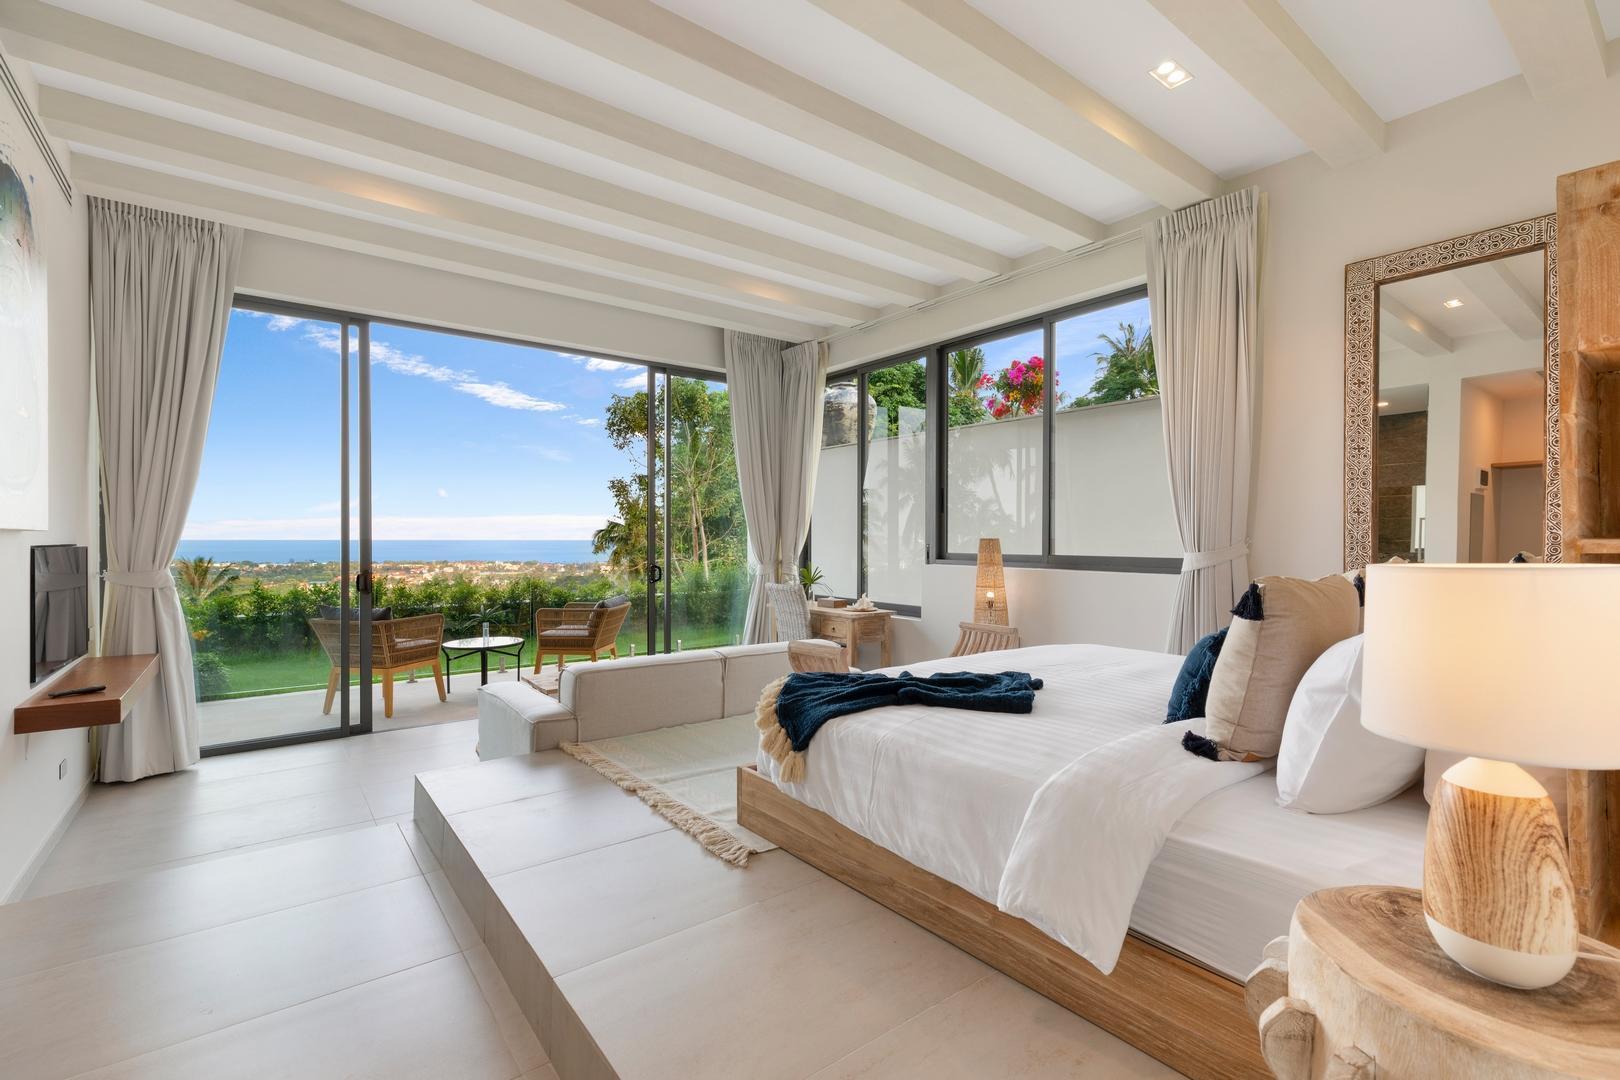 Asi by Pavana- 6 Bedrooms Luxury Villa 6 ห้องนอน 6 ห้องน้ำส่วนตัว ขนาด 634 ตร.ม. – หาดเฉวง